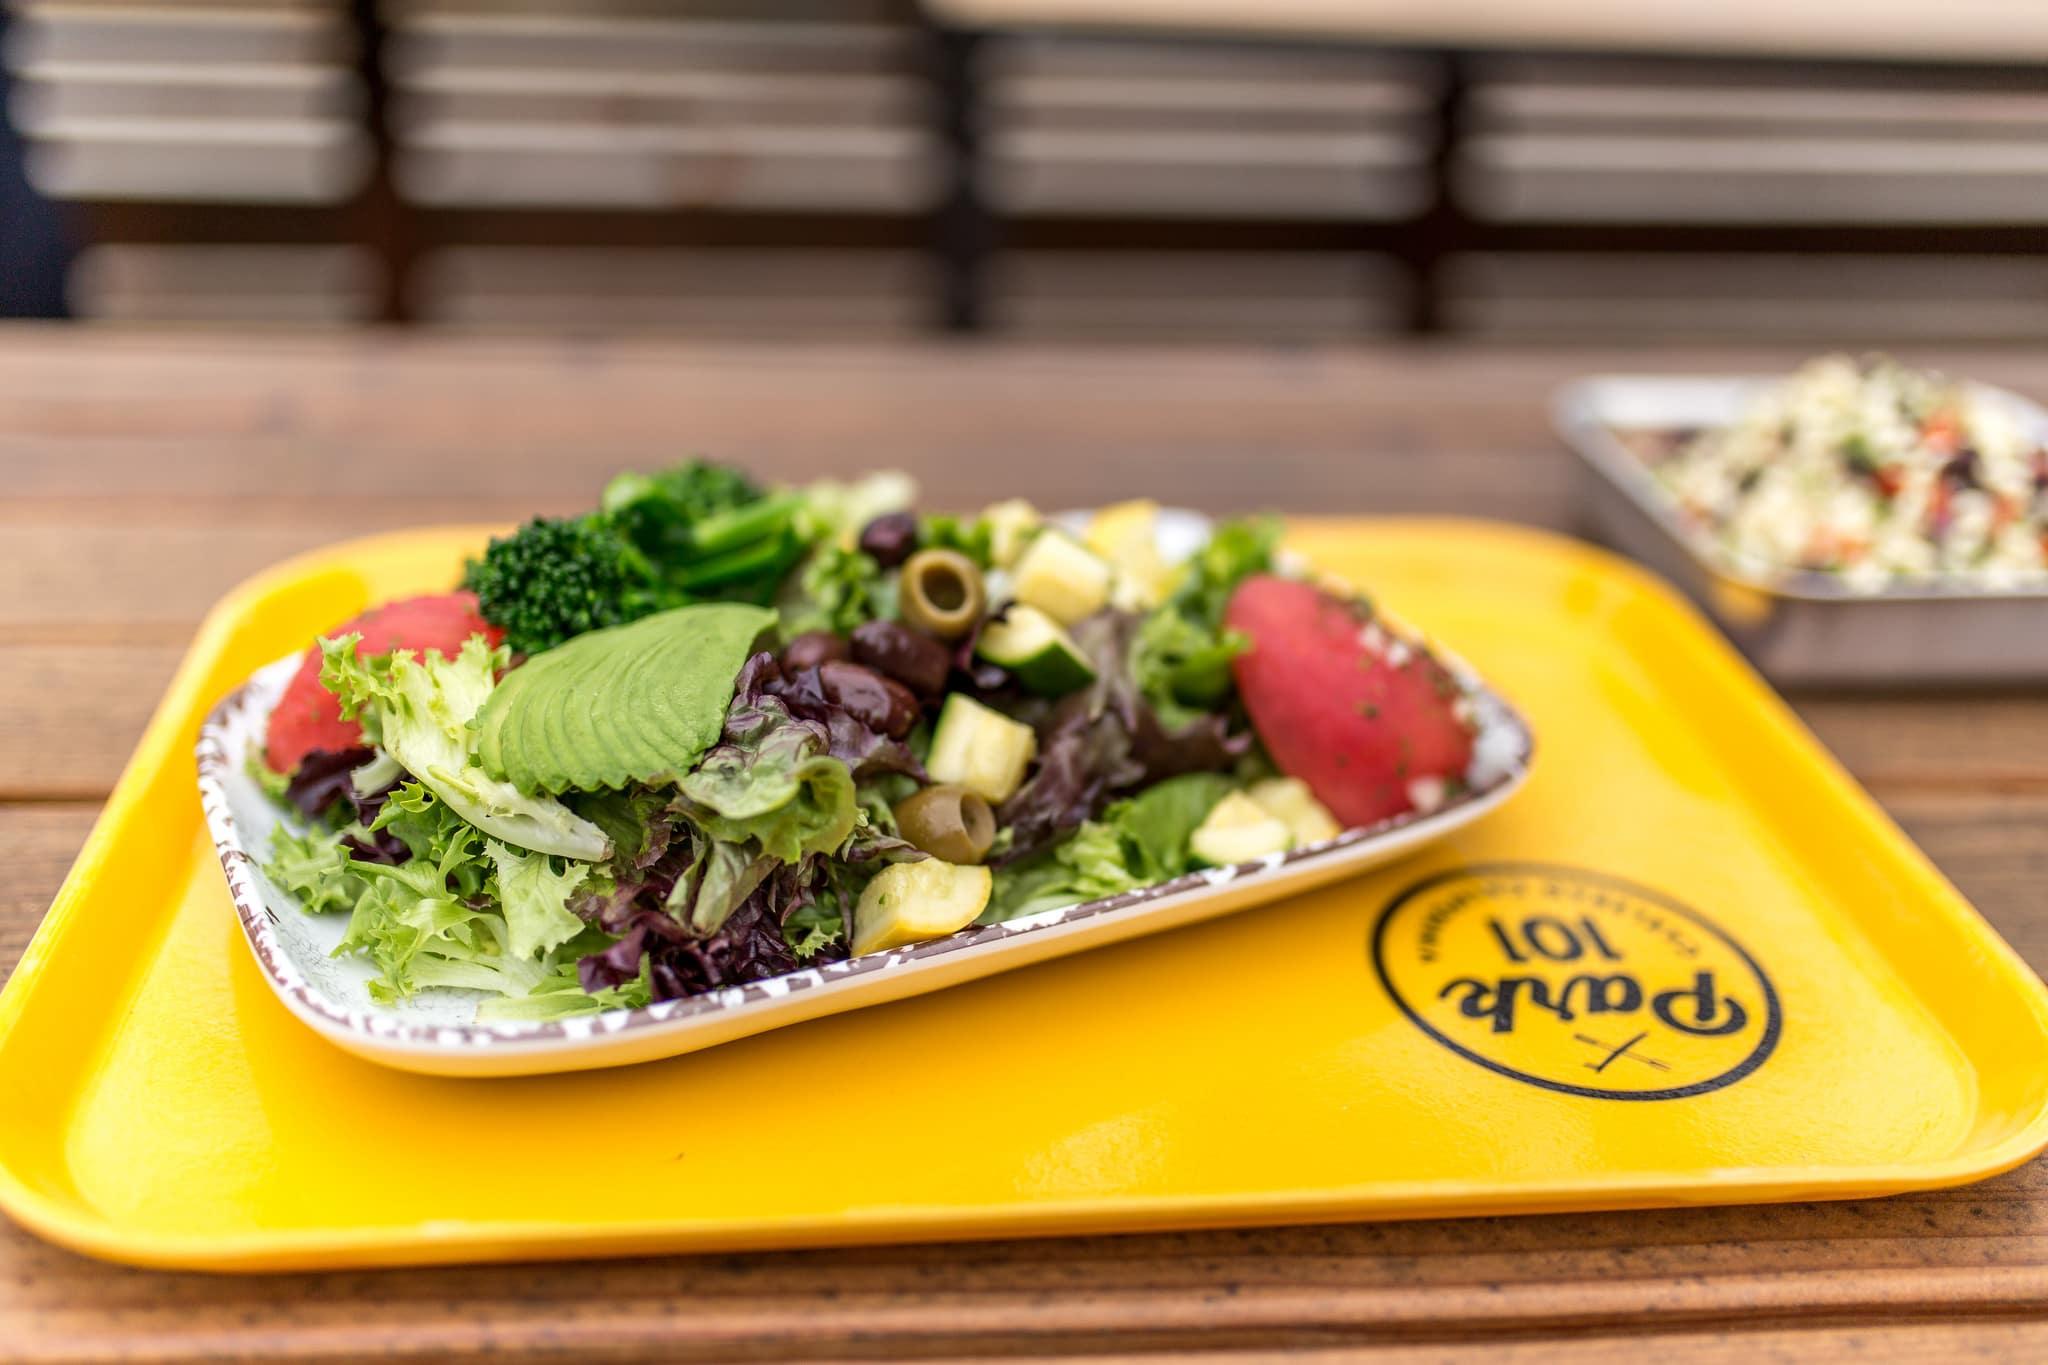 Park 101 Carlsbad salad